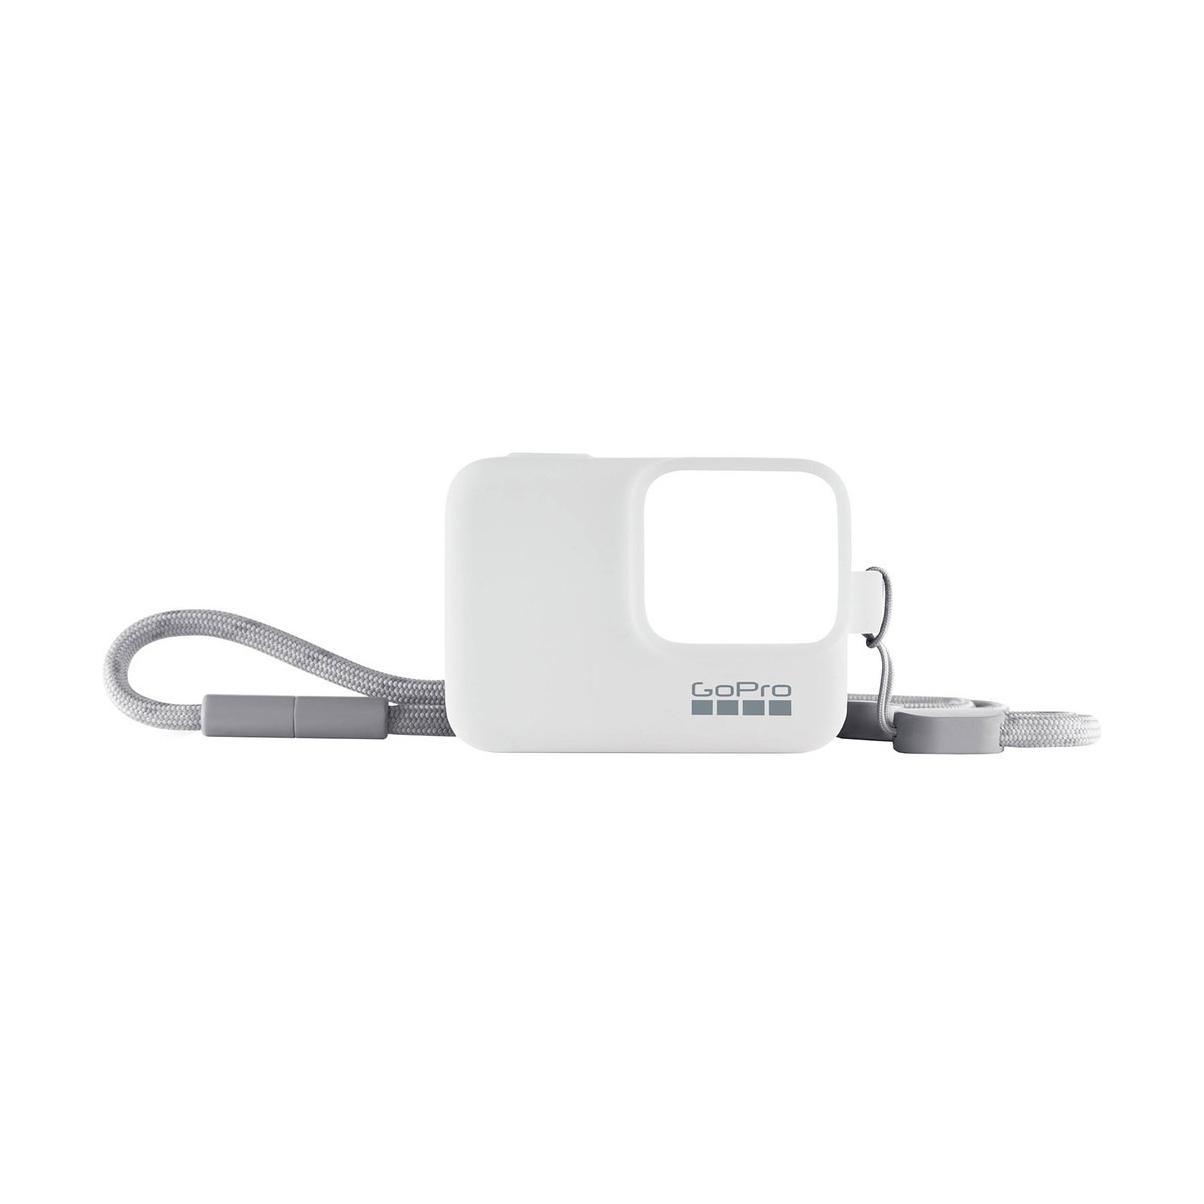 Чехол для камеры GoPro ACSST-002, белый аквабокс gopro aadiv 001 для hero5 6 black 60м